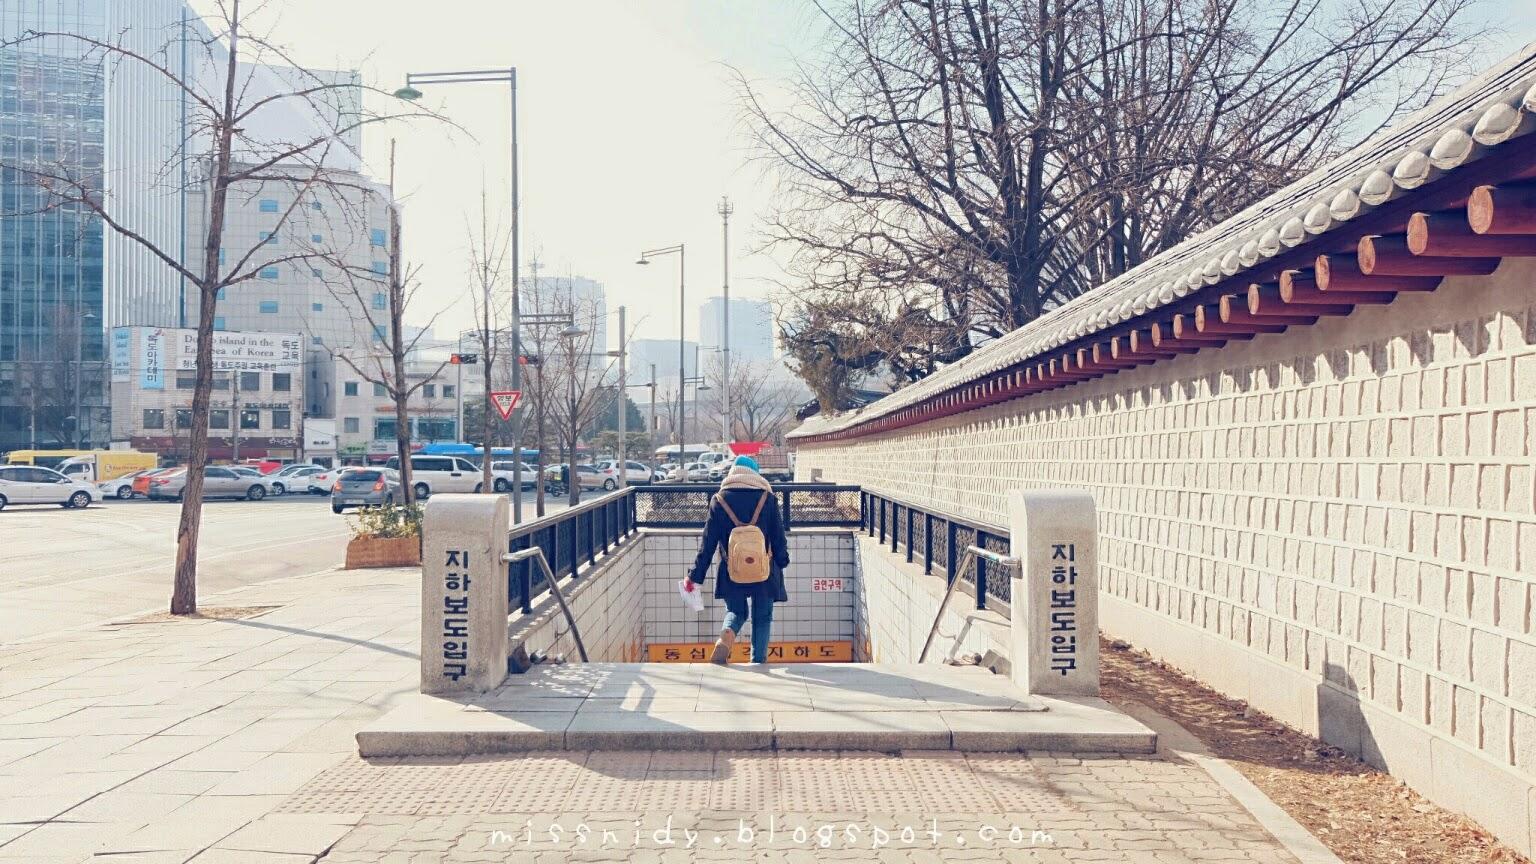 pengalaman nyasar di seoul korea selatan